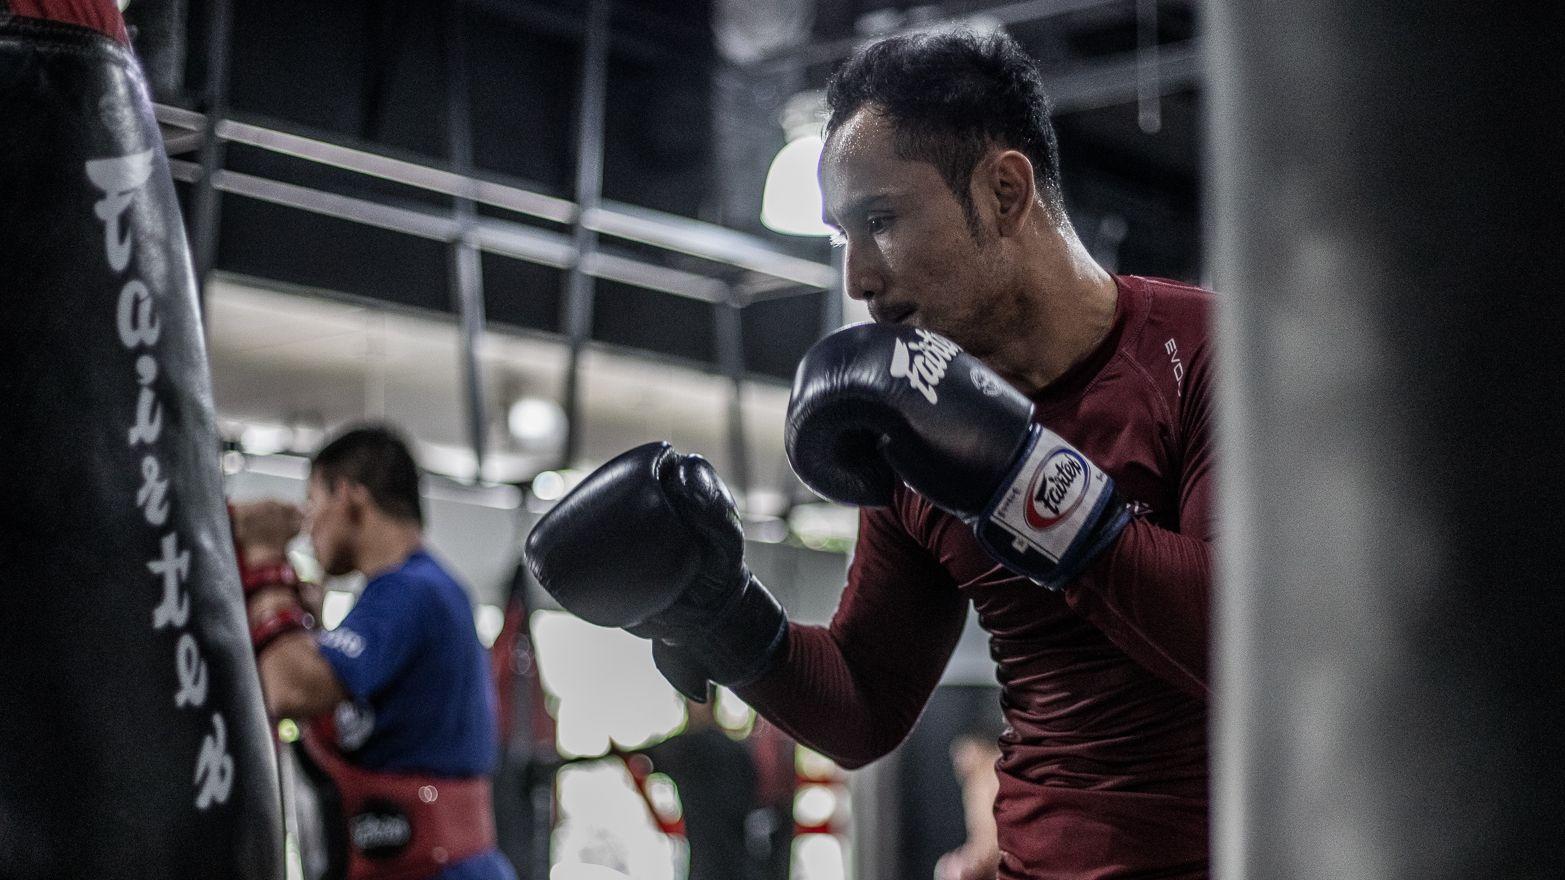 Sam-A training Muay Thai on a heavy bag.